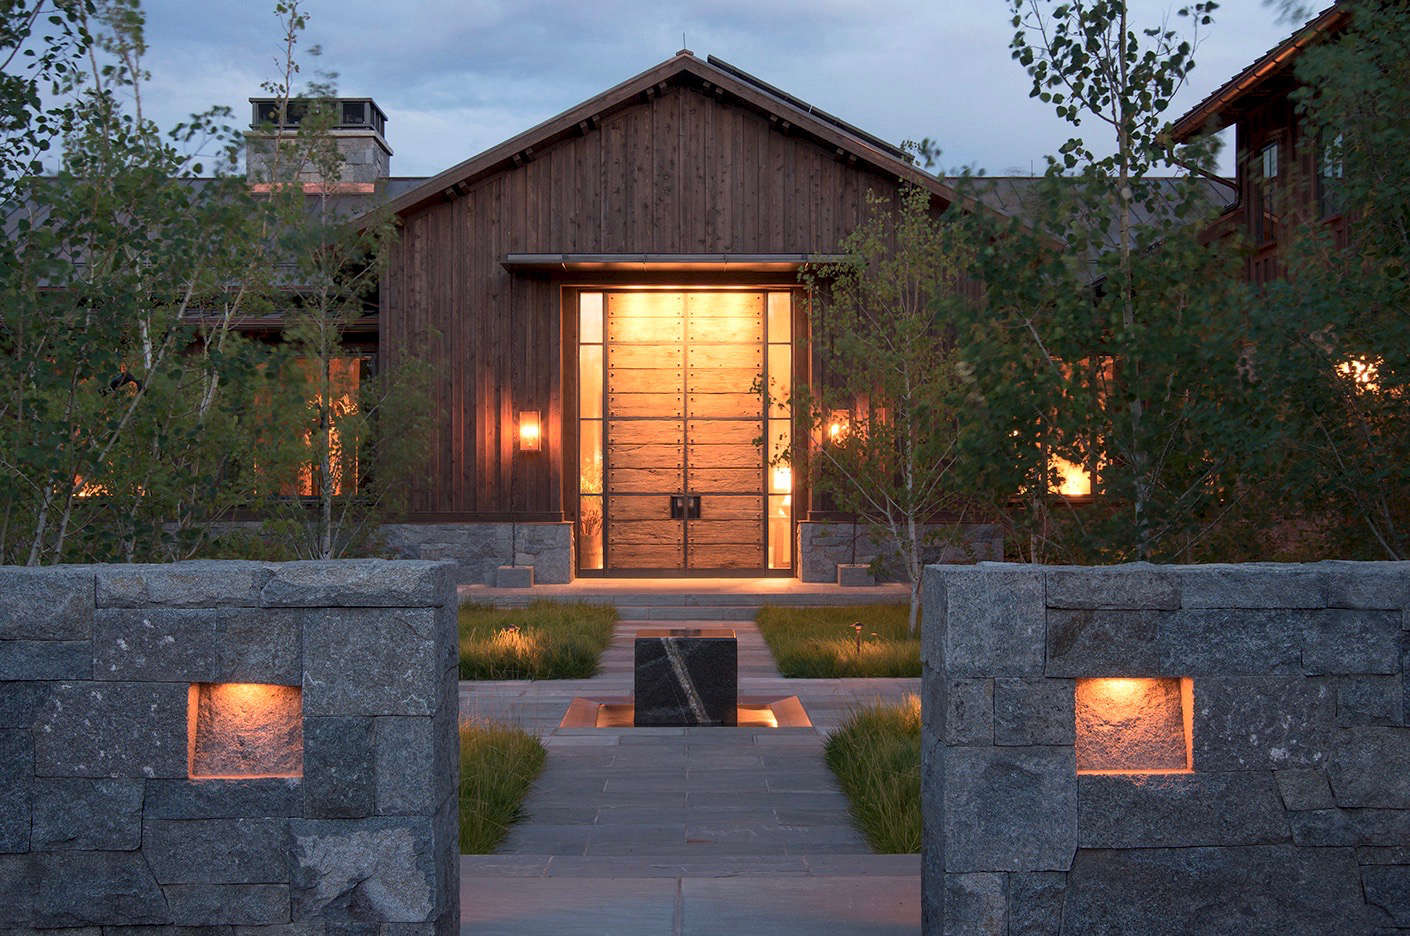 dbx-ranch-asla-aspen-design-workshop-4